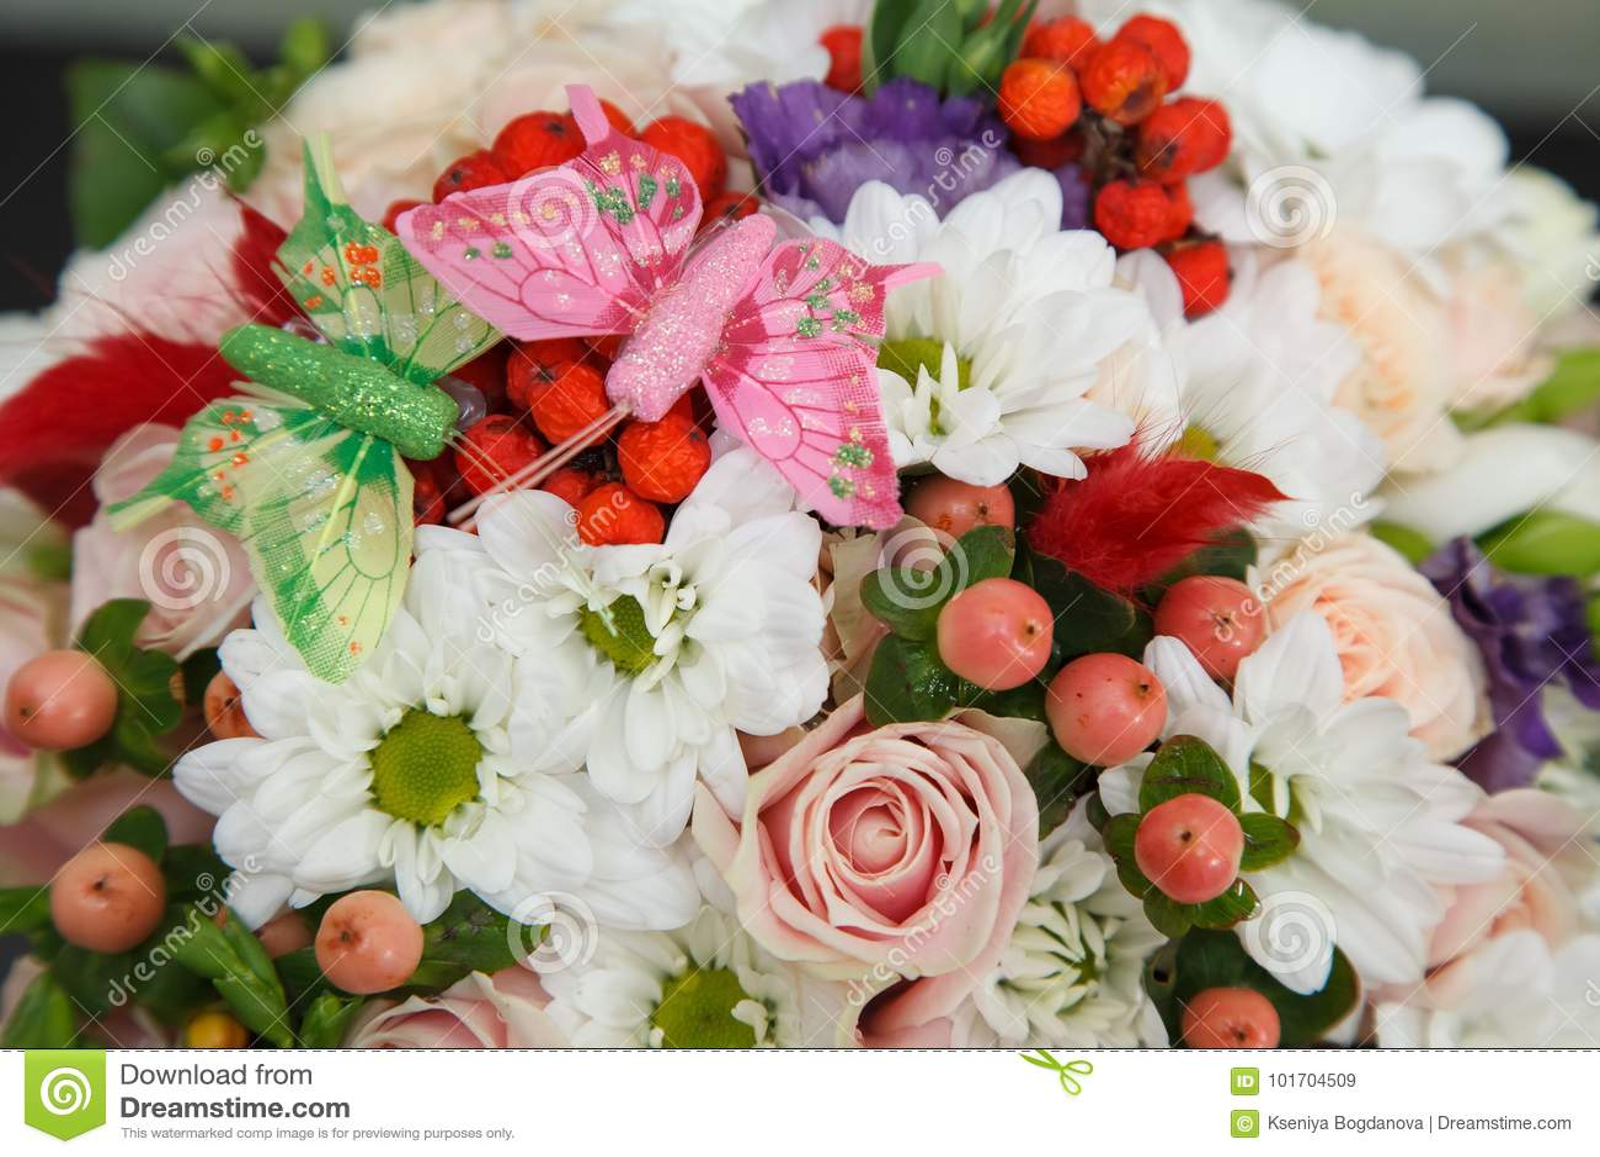 Flower Arrangement With Butterflies Stock Image Image Of